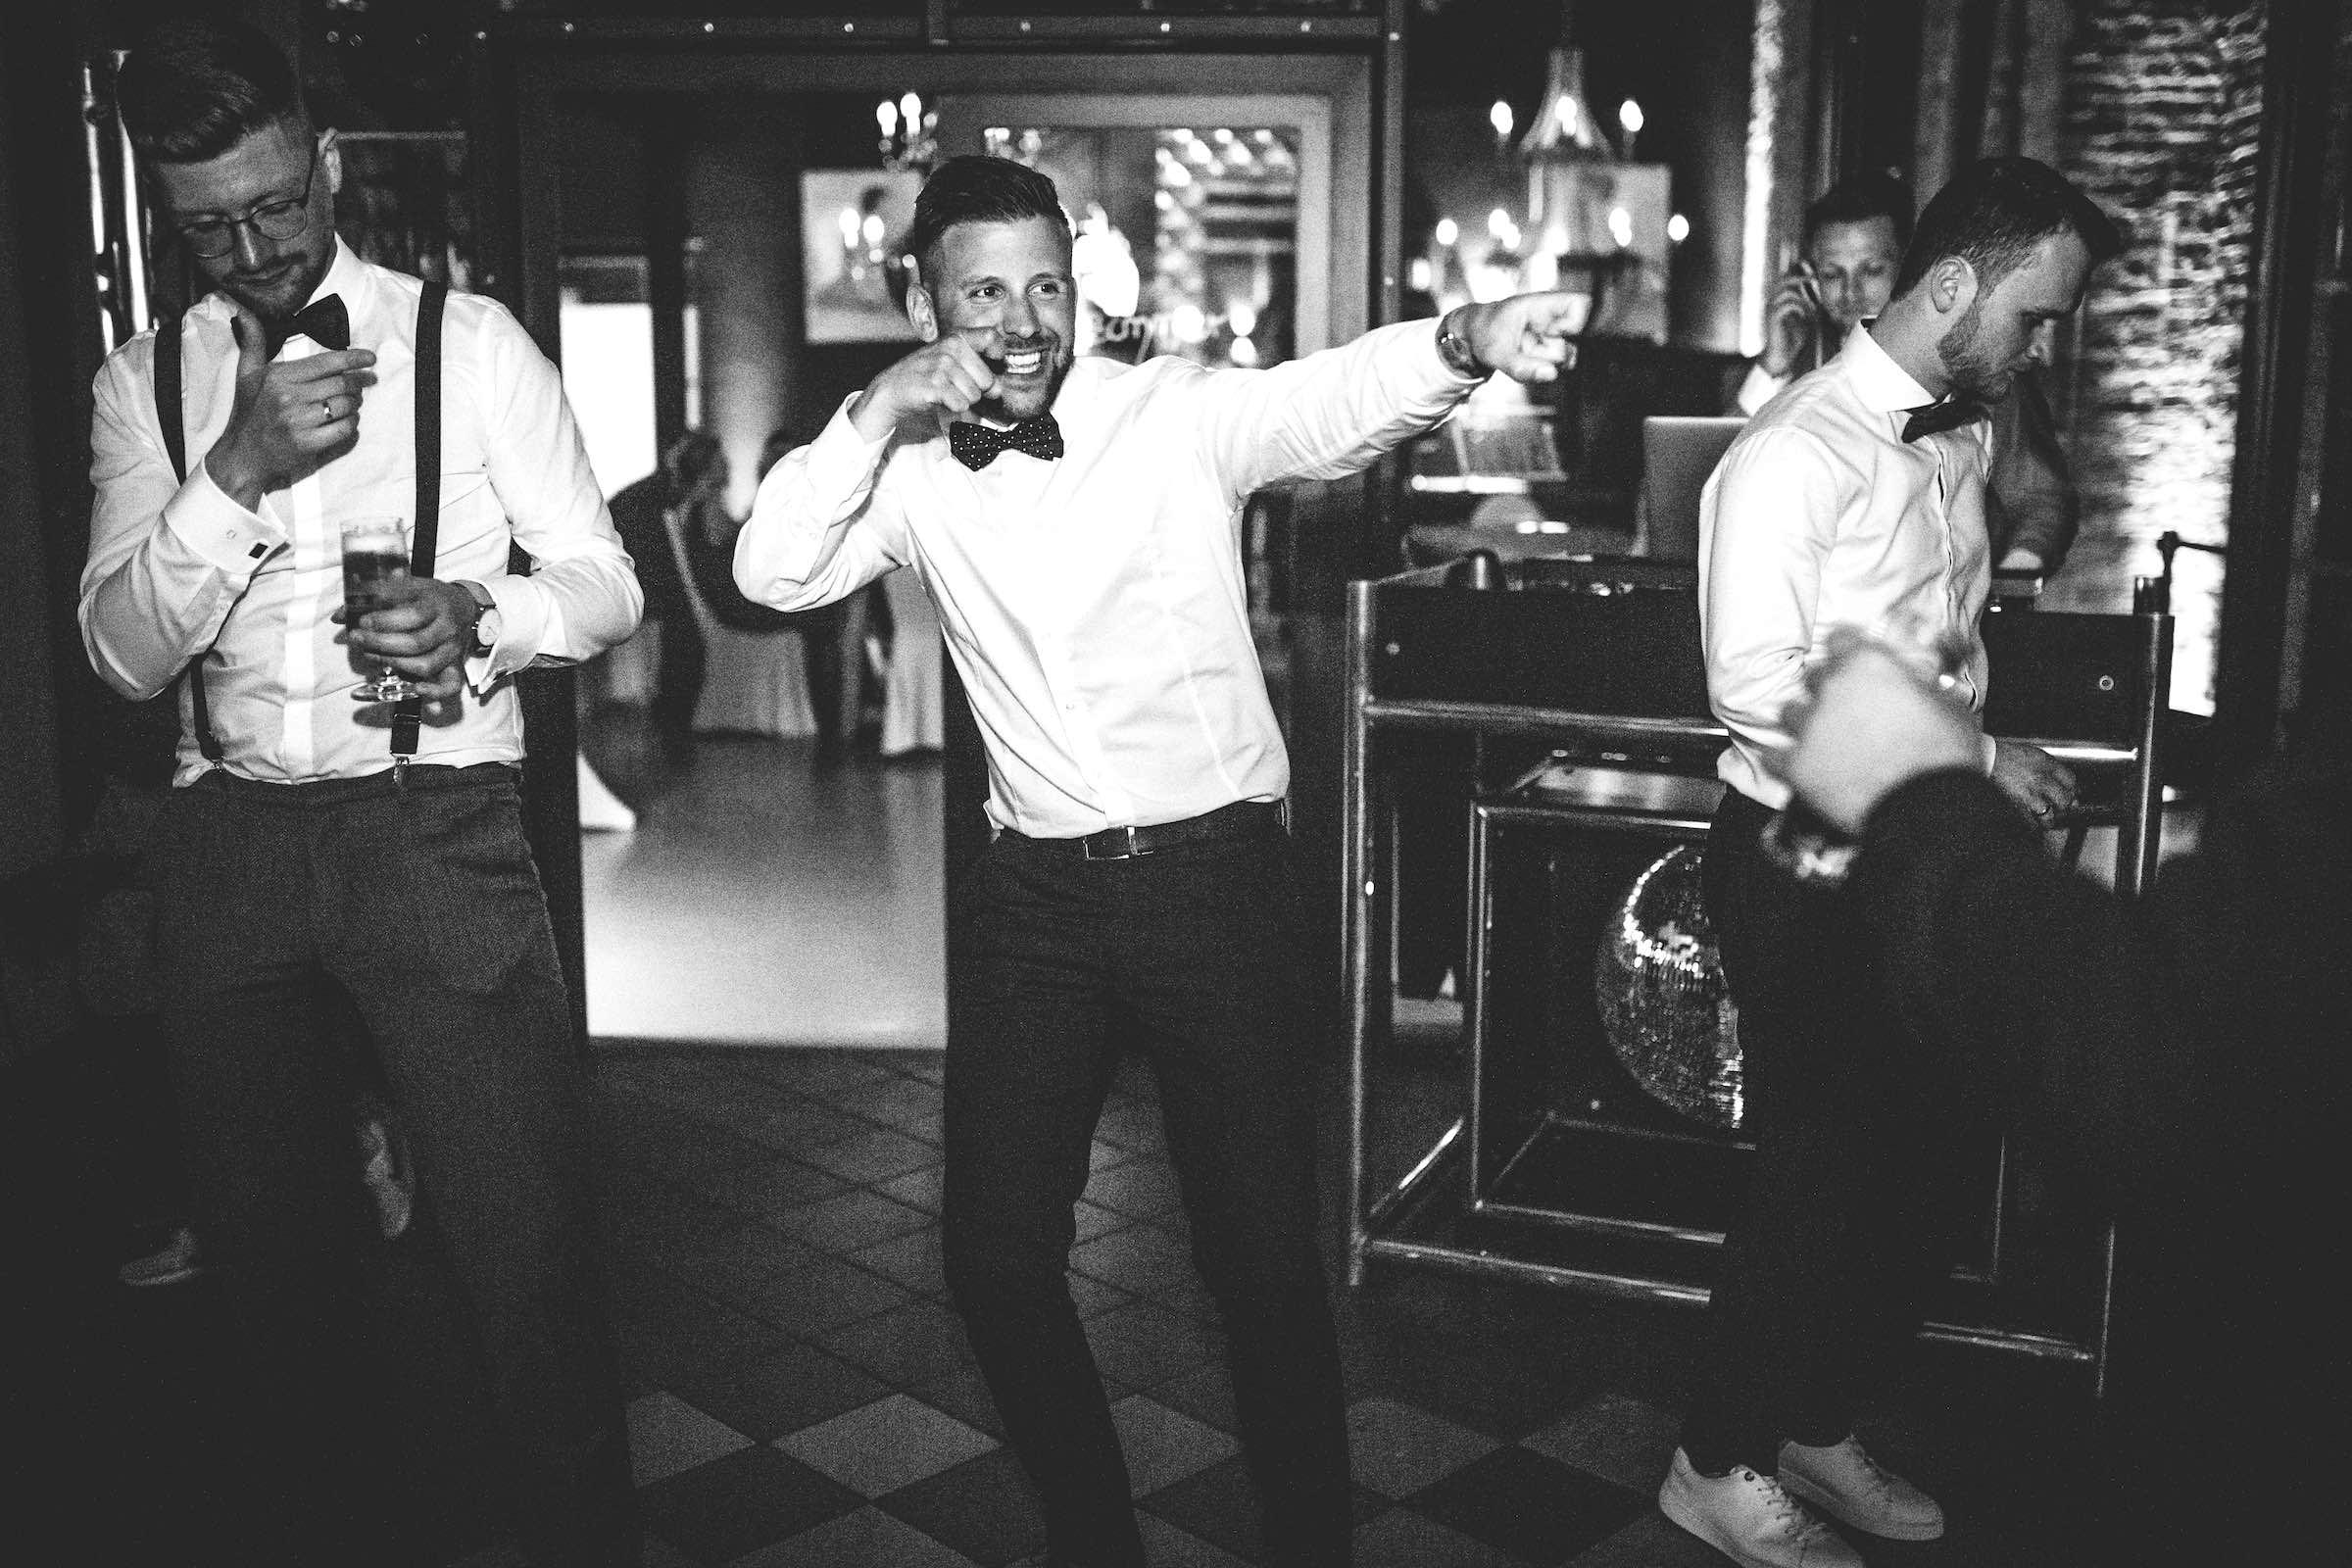 DJ | Hochzeit | Mieten | DJ | Agentur | DJ | Service | DJ | Feier | Hochzeits | DJ | Messe | DJ | Firmenevent | Firmenfeier | DJ | Geburtstag | Discjockey | Weihnachtsfeier | DJ | Sommerfest | Event | Buchen | Lehmann | Eventservice